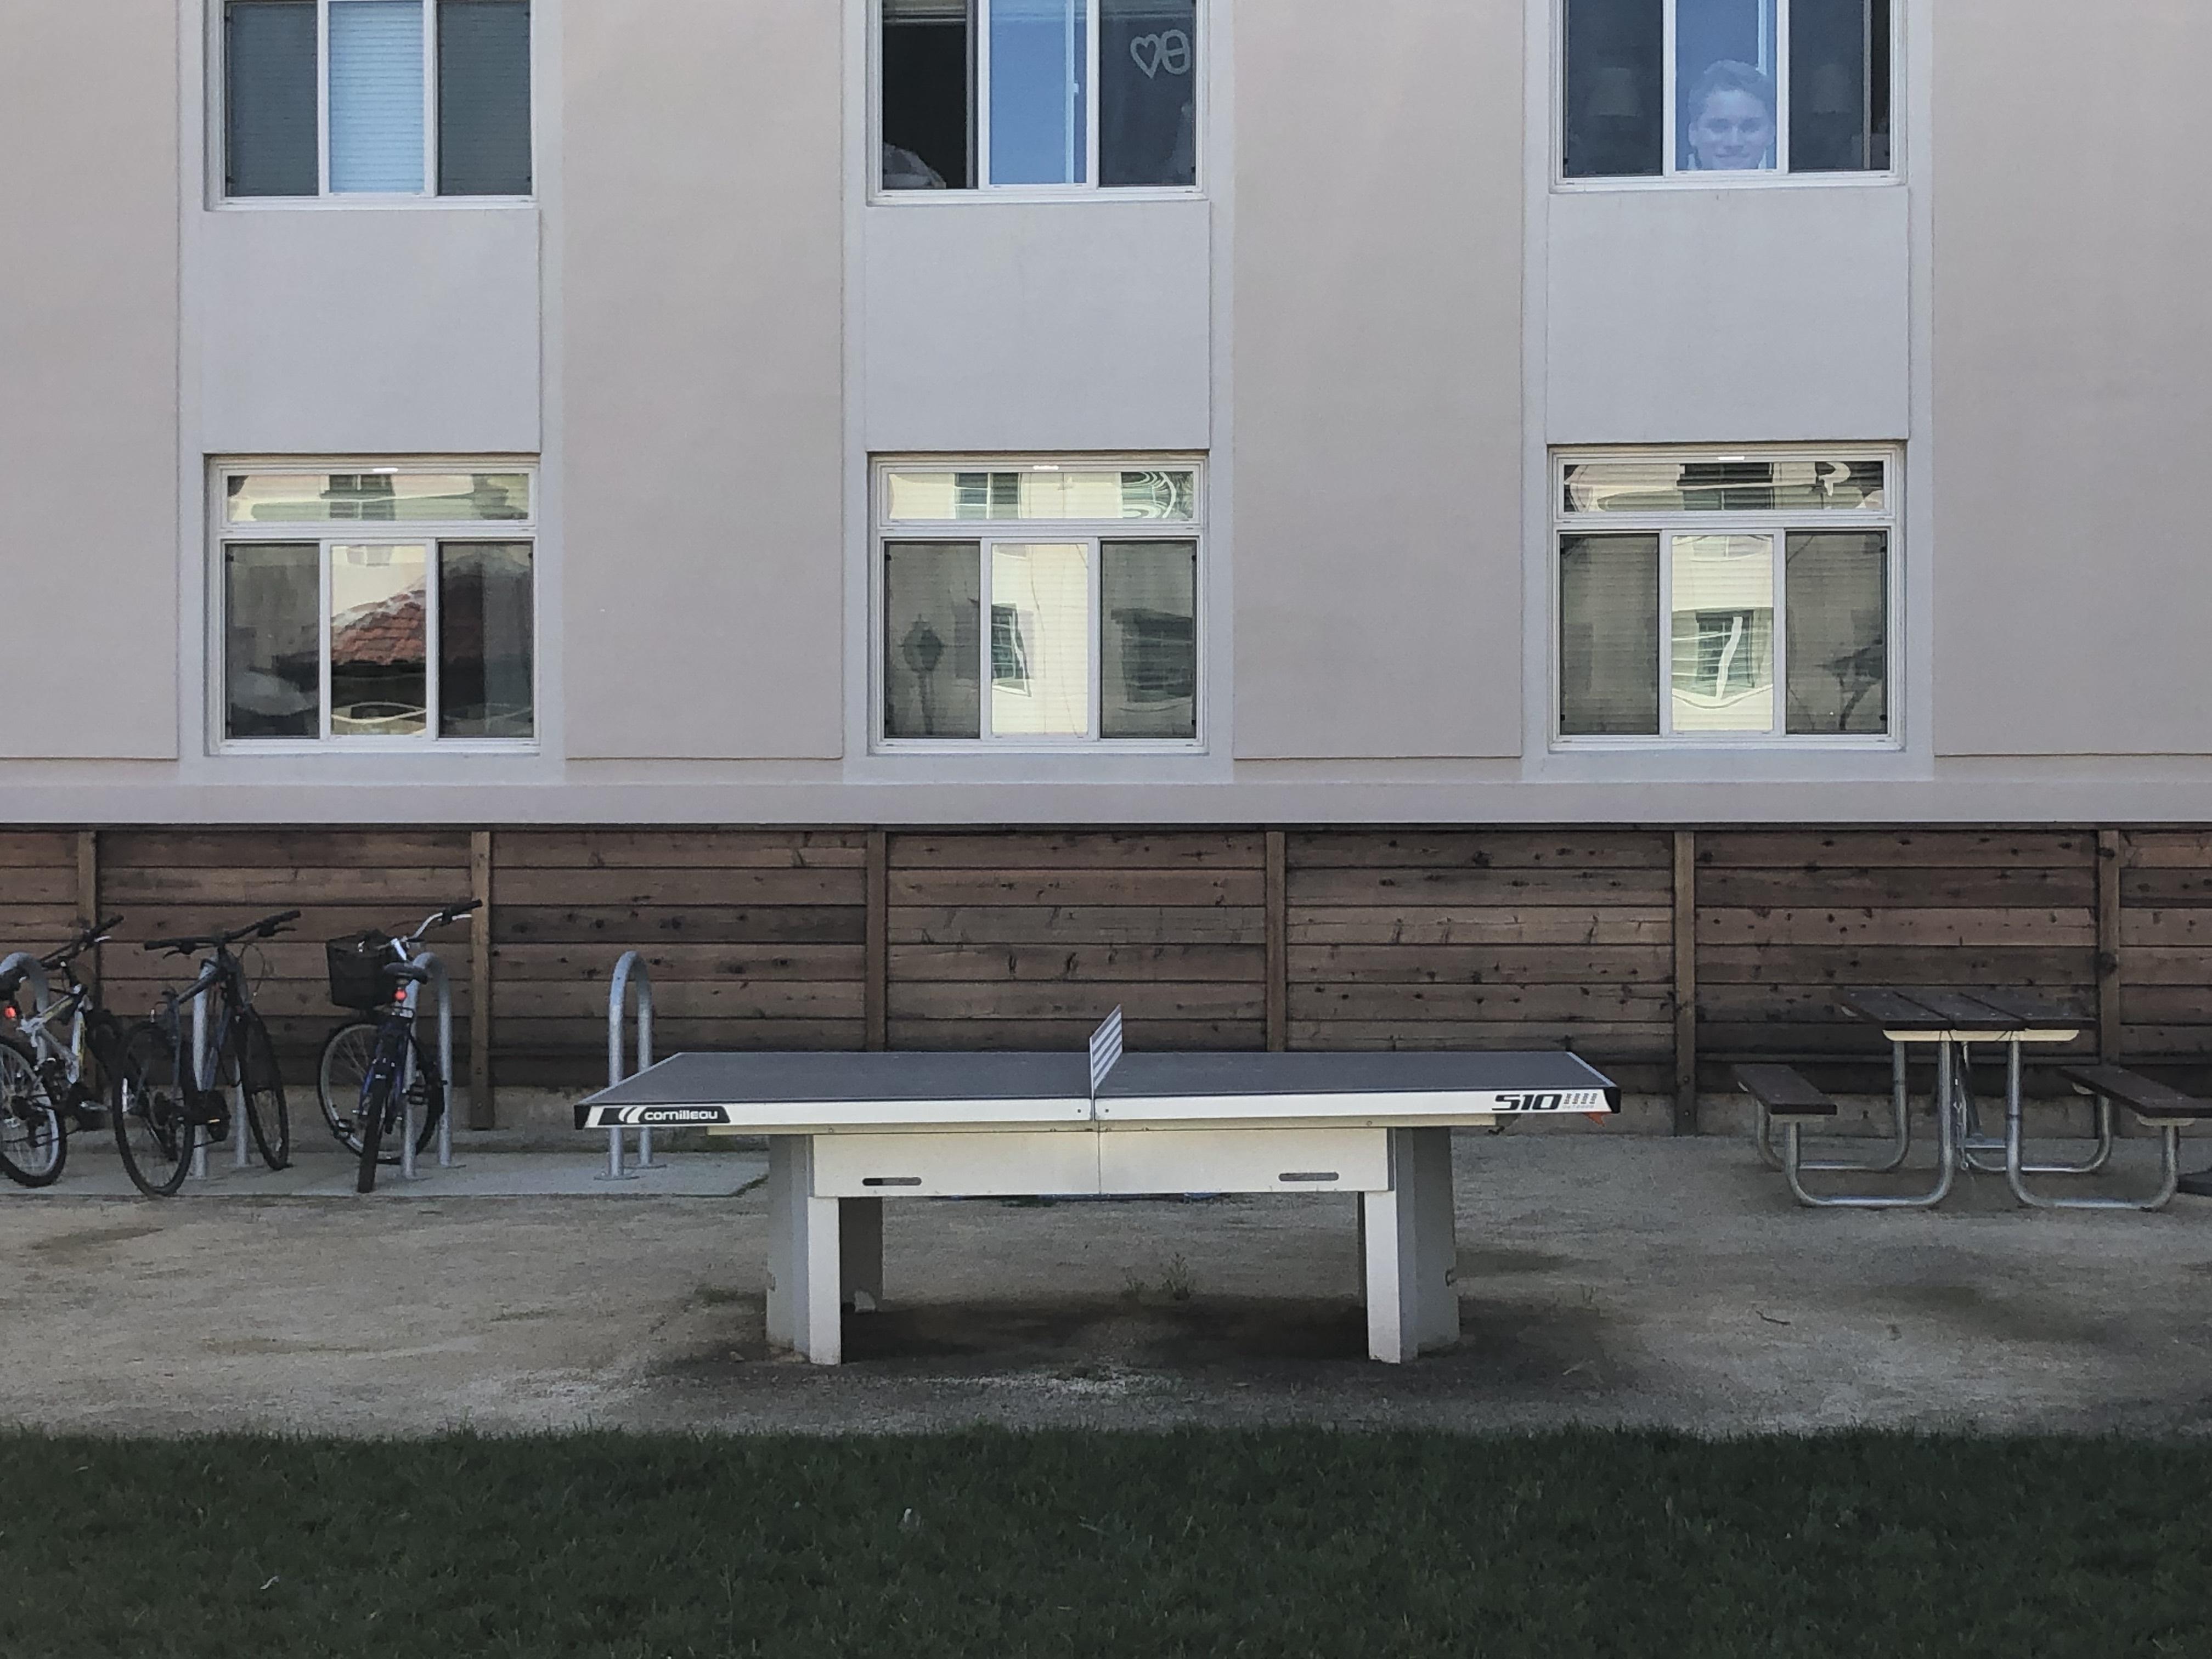 cornilleau 510 stationary ping pong table santa clara university